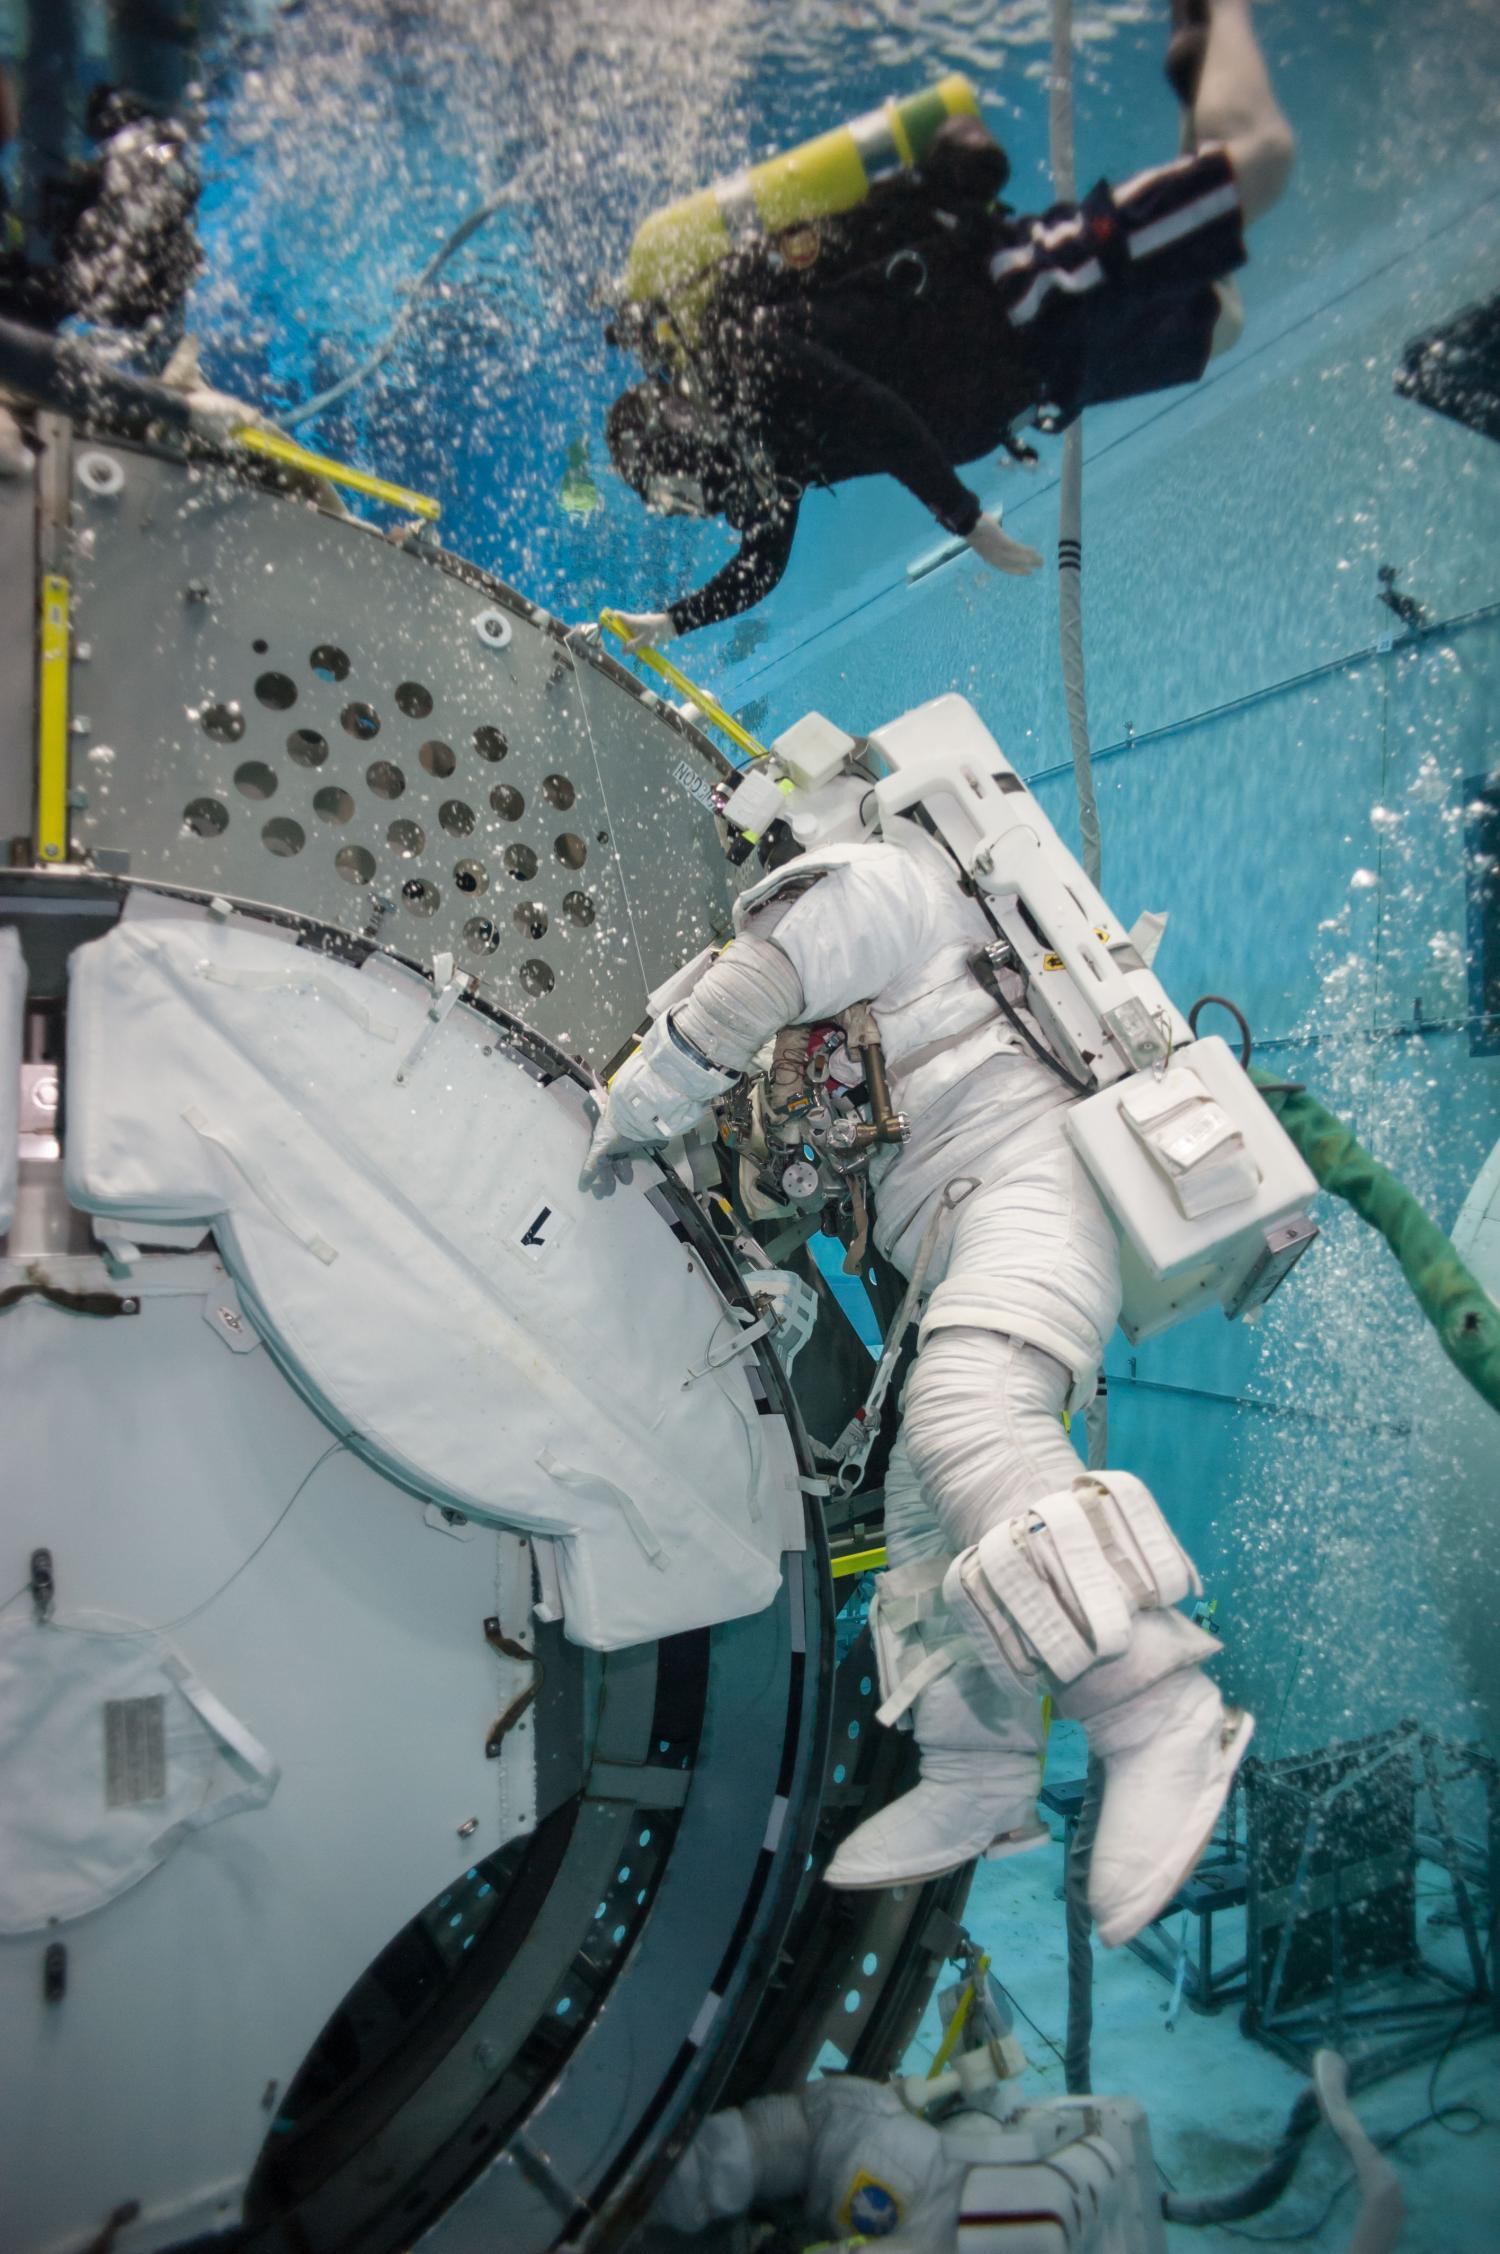 astronaut on spaceship - photo #48